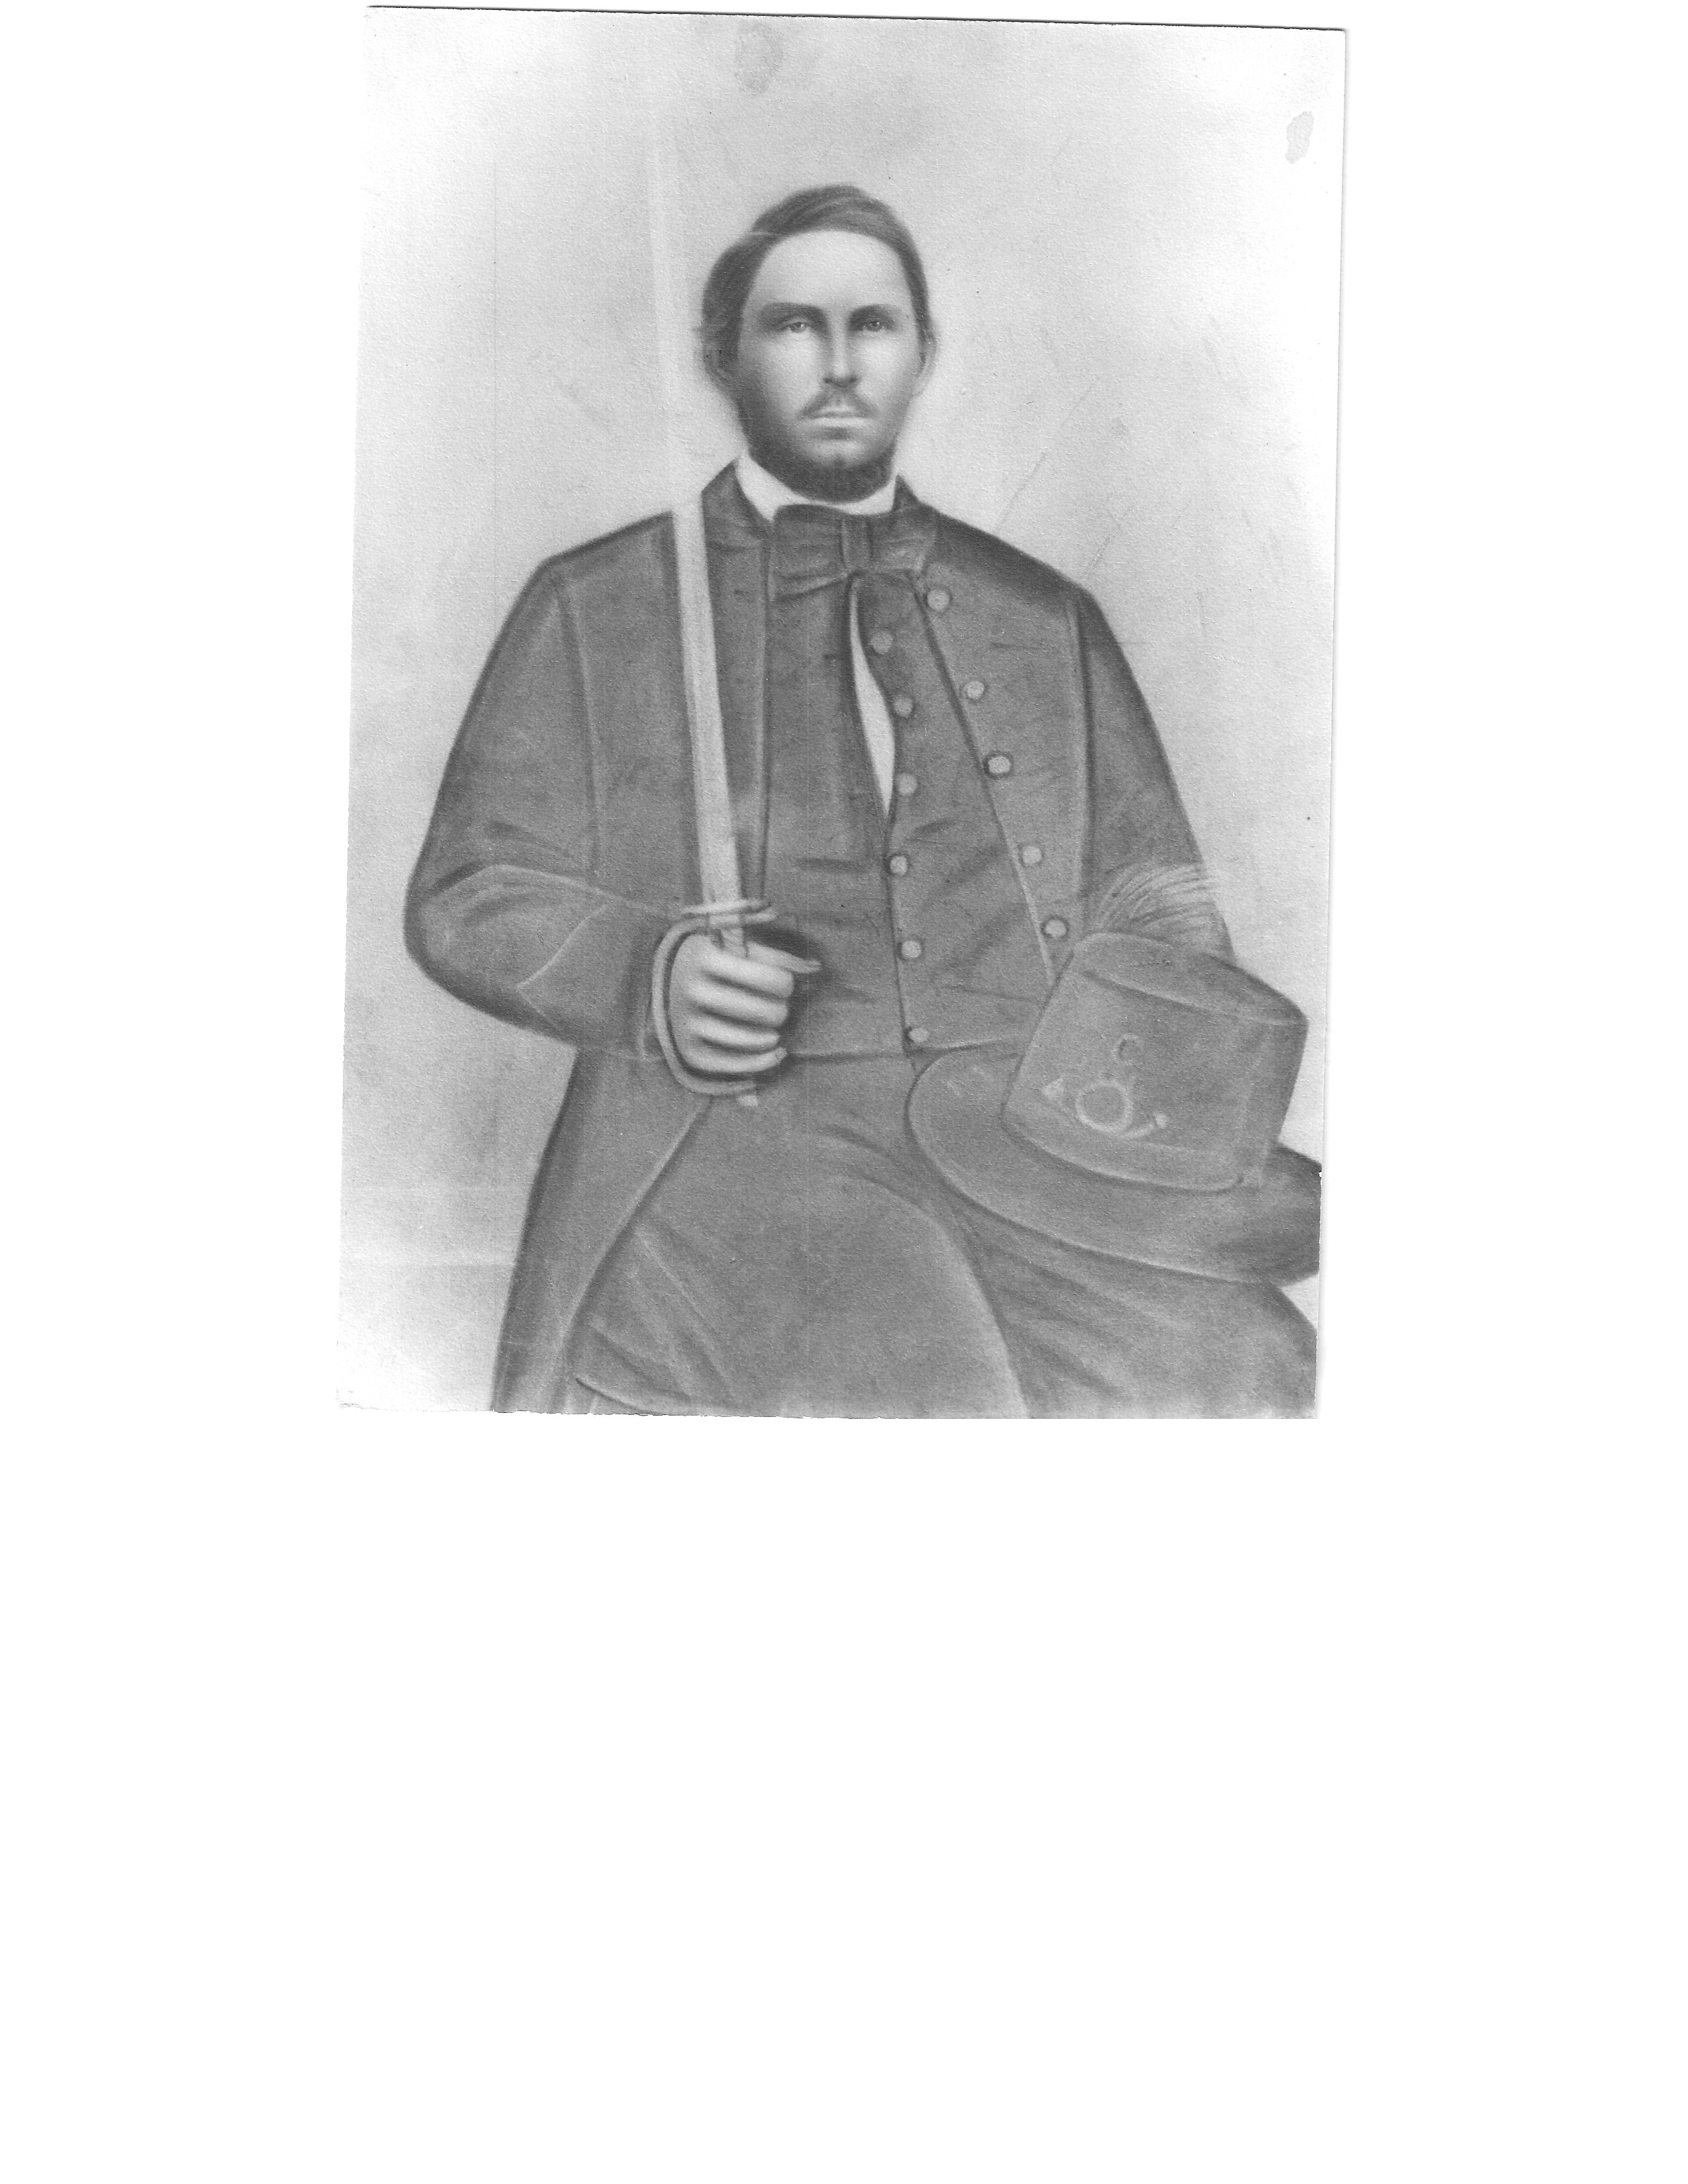 Isaac Neff